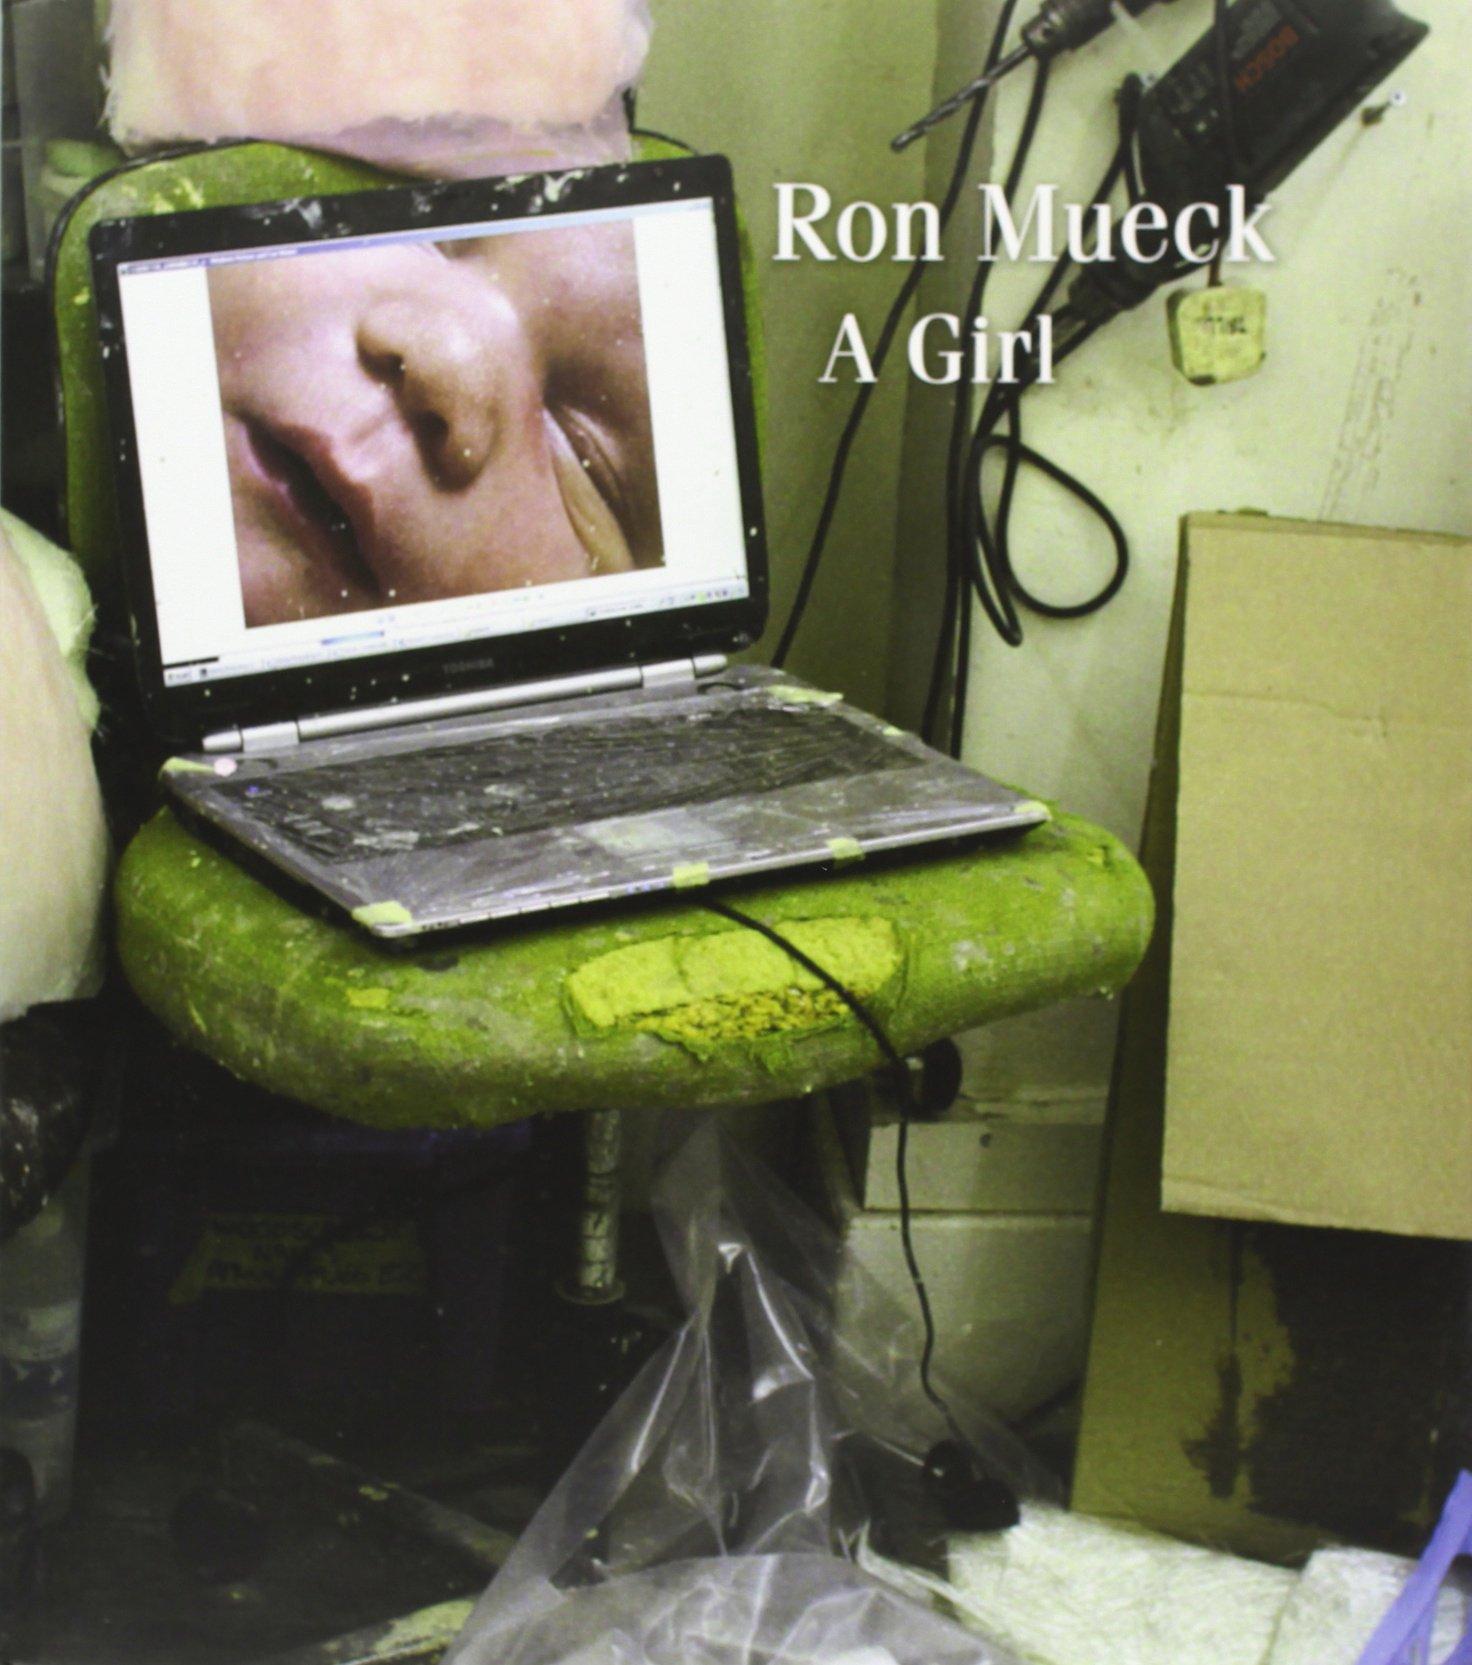 Ron mueck a girl: Amazon.es: Greeves, Susanna, Raine, Craig ...